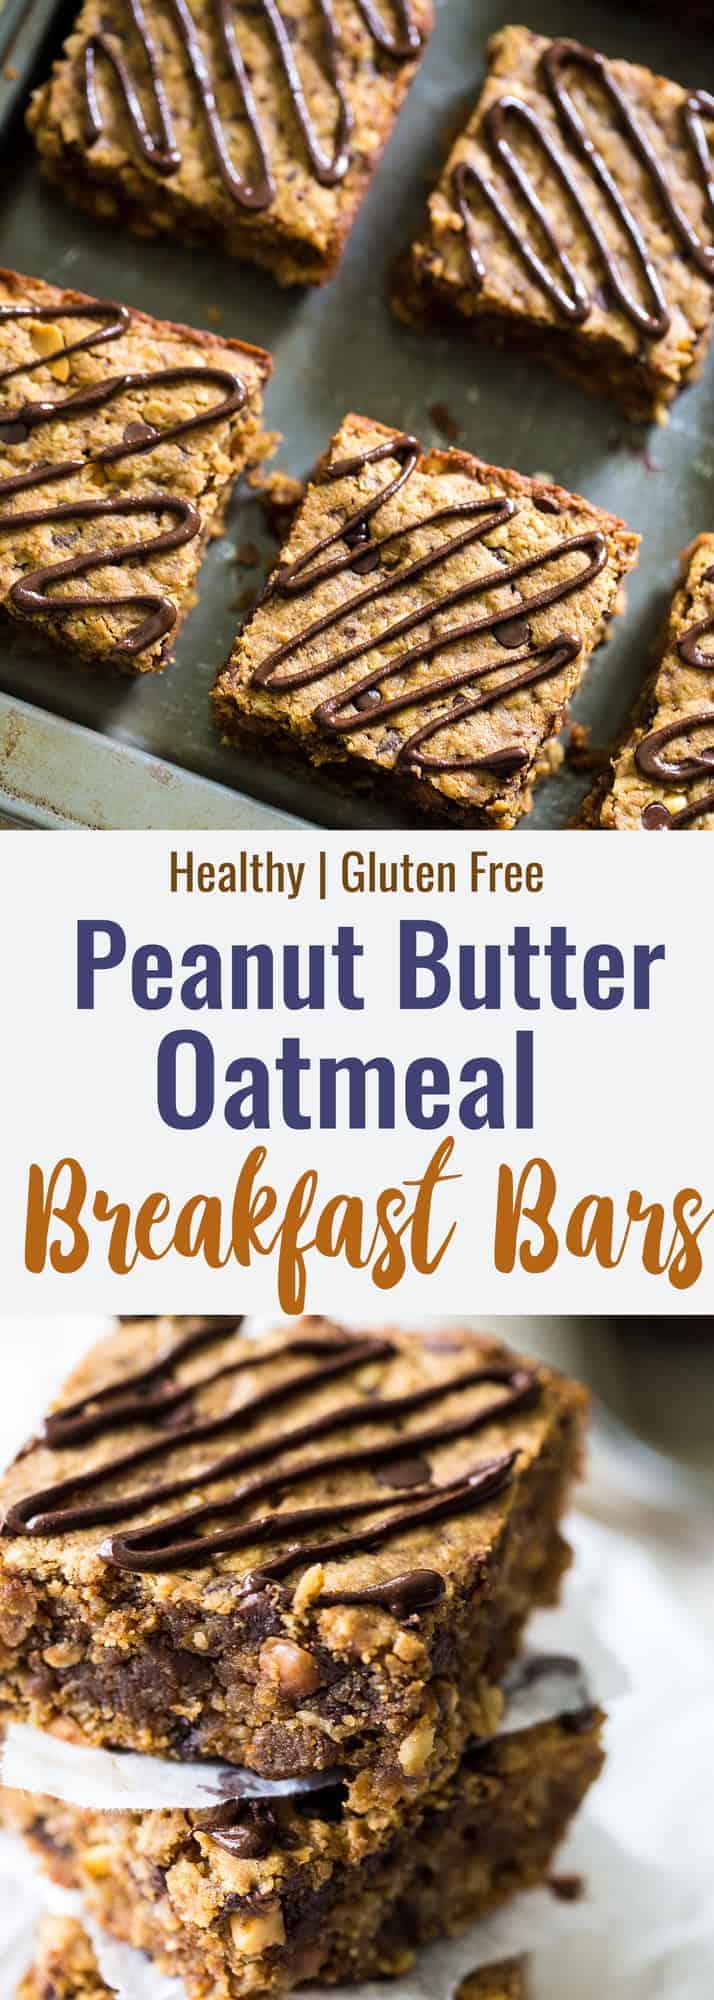 Healthy Breakfast Bars collage photo